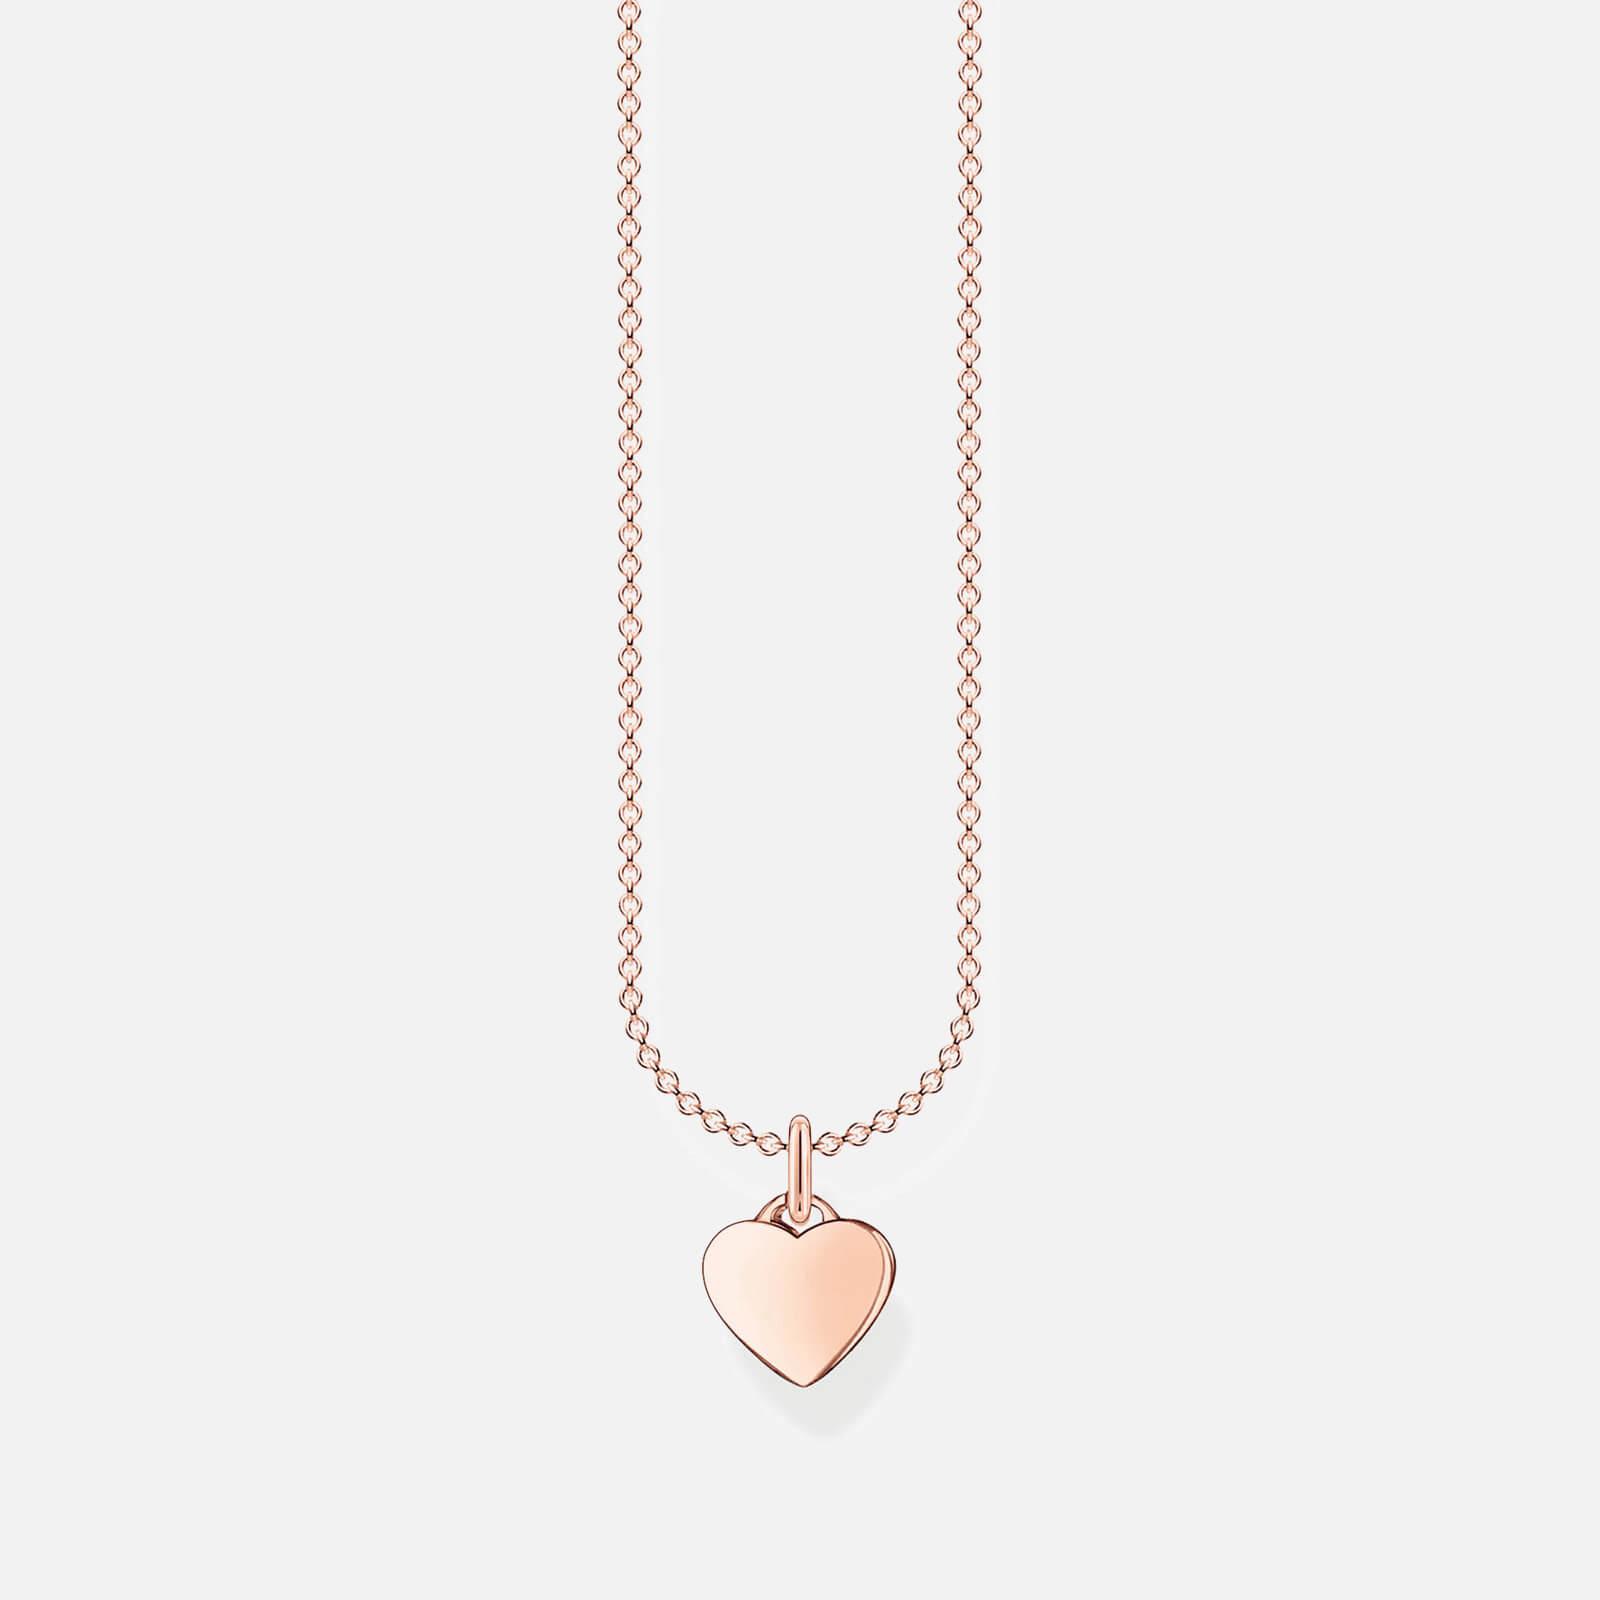 Thomas Sabo Women's Necklace - Rose Gold-Coloured